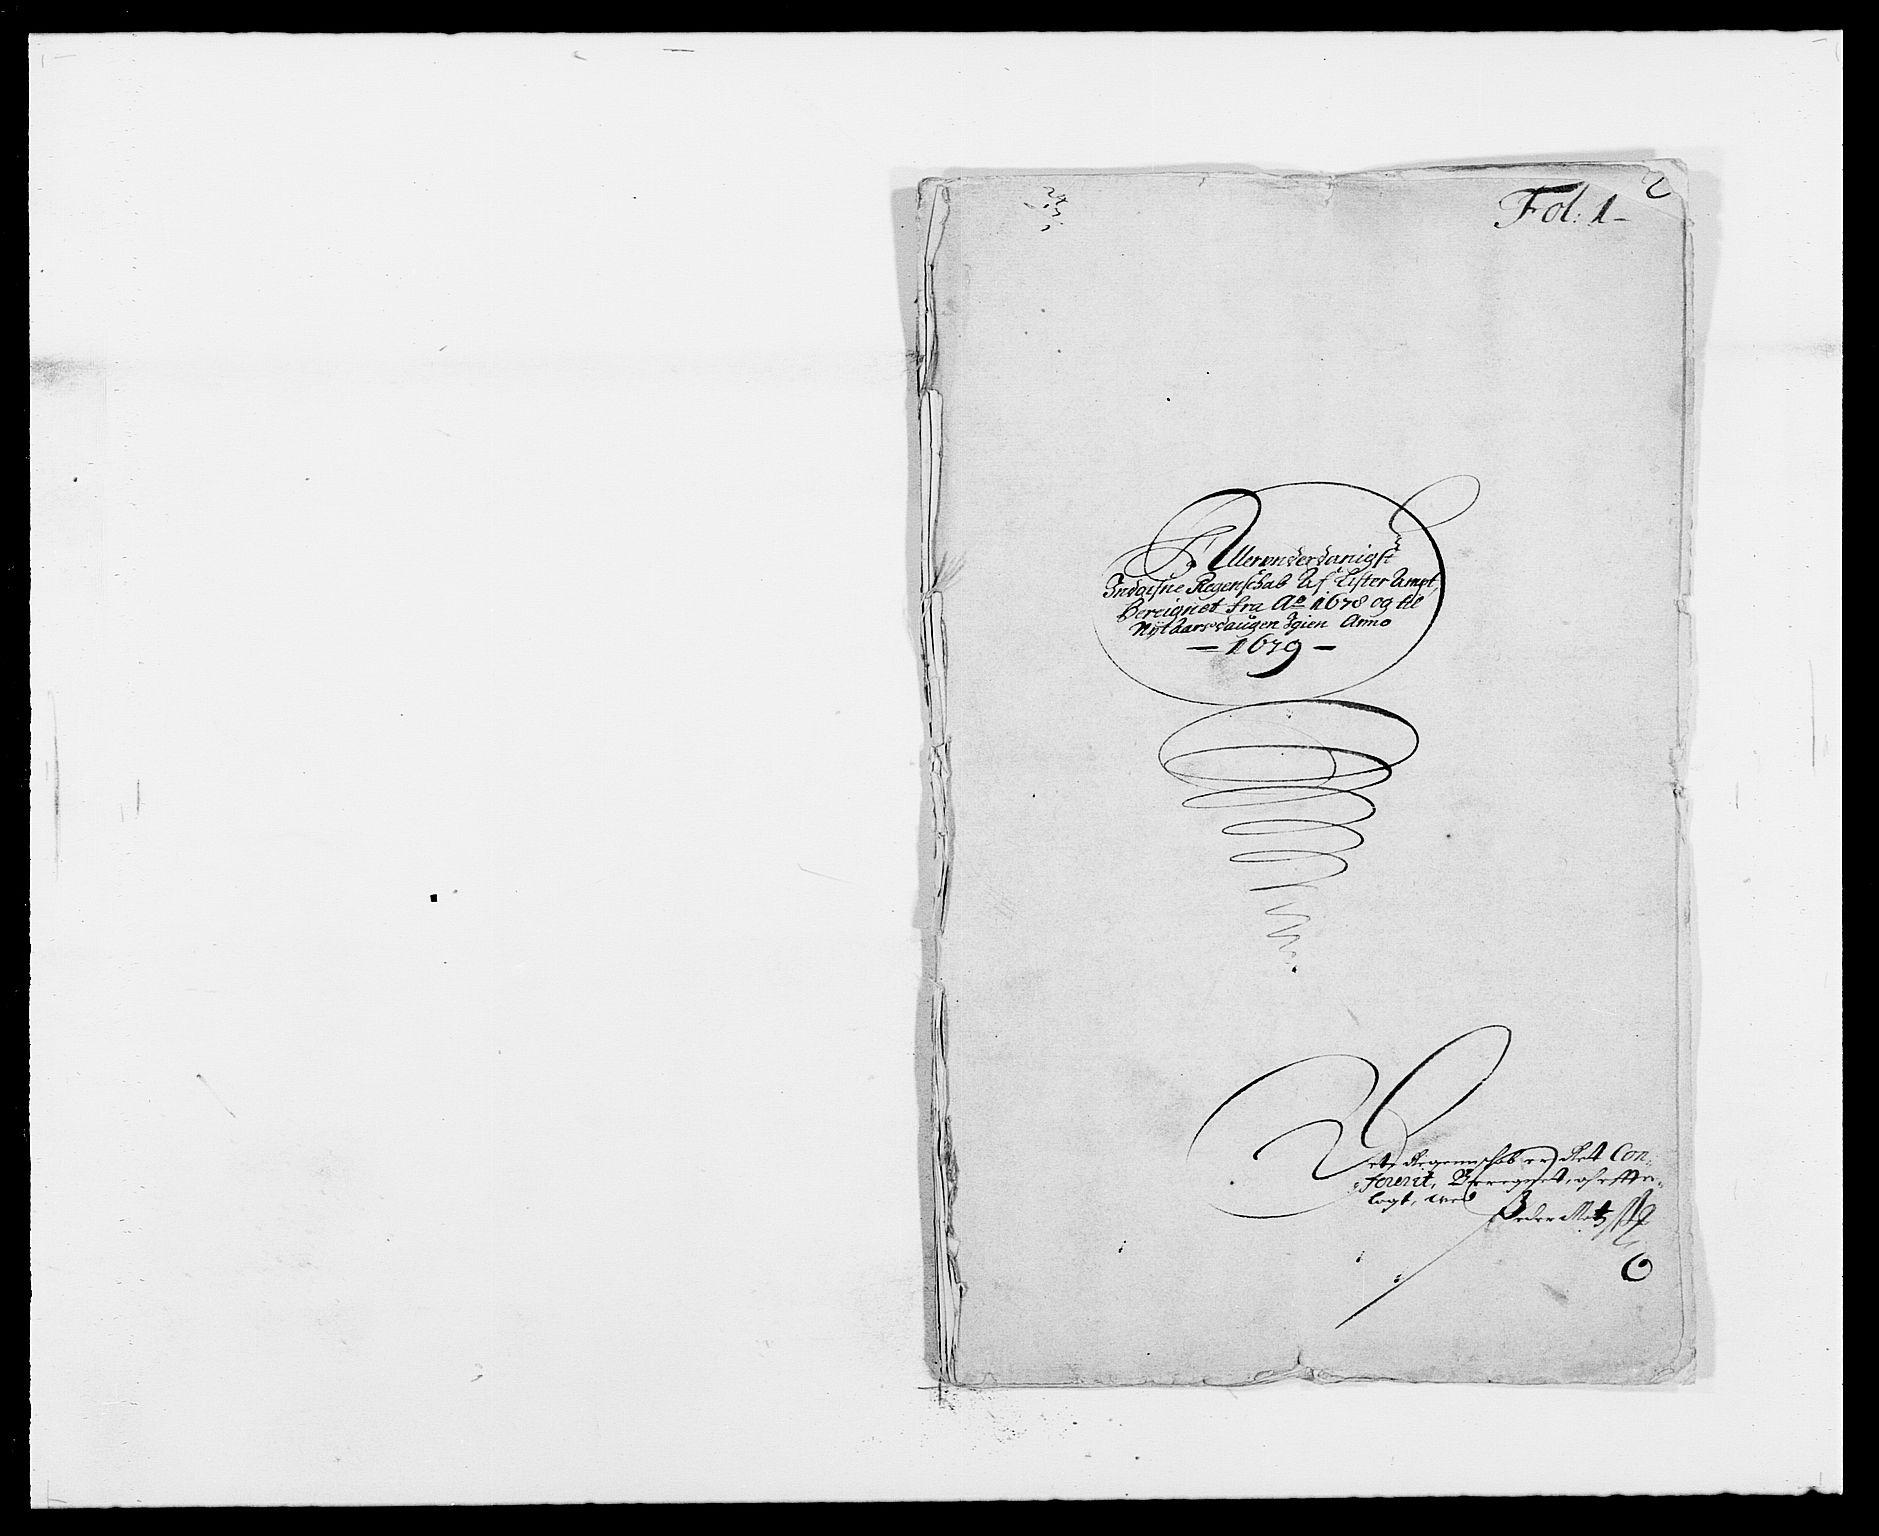 RA, Rentekammeret inntil 1814, Reviderte regnskaper, Fogderegnskap, R41/L2530: Fogderegnskap Lista, 1677-1679, s. 164